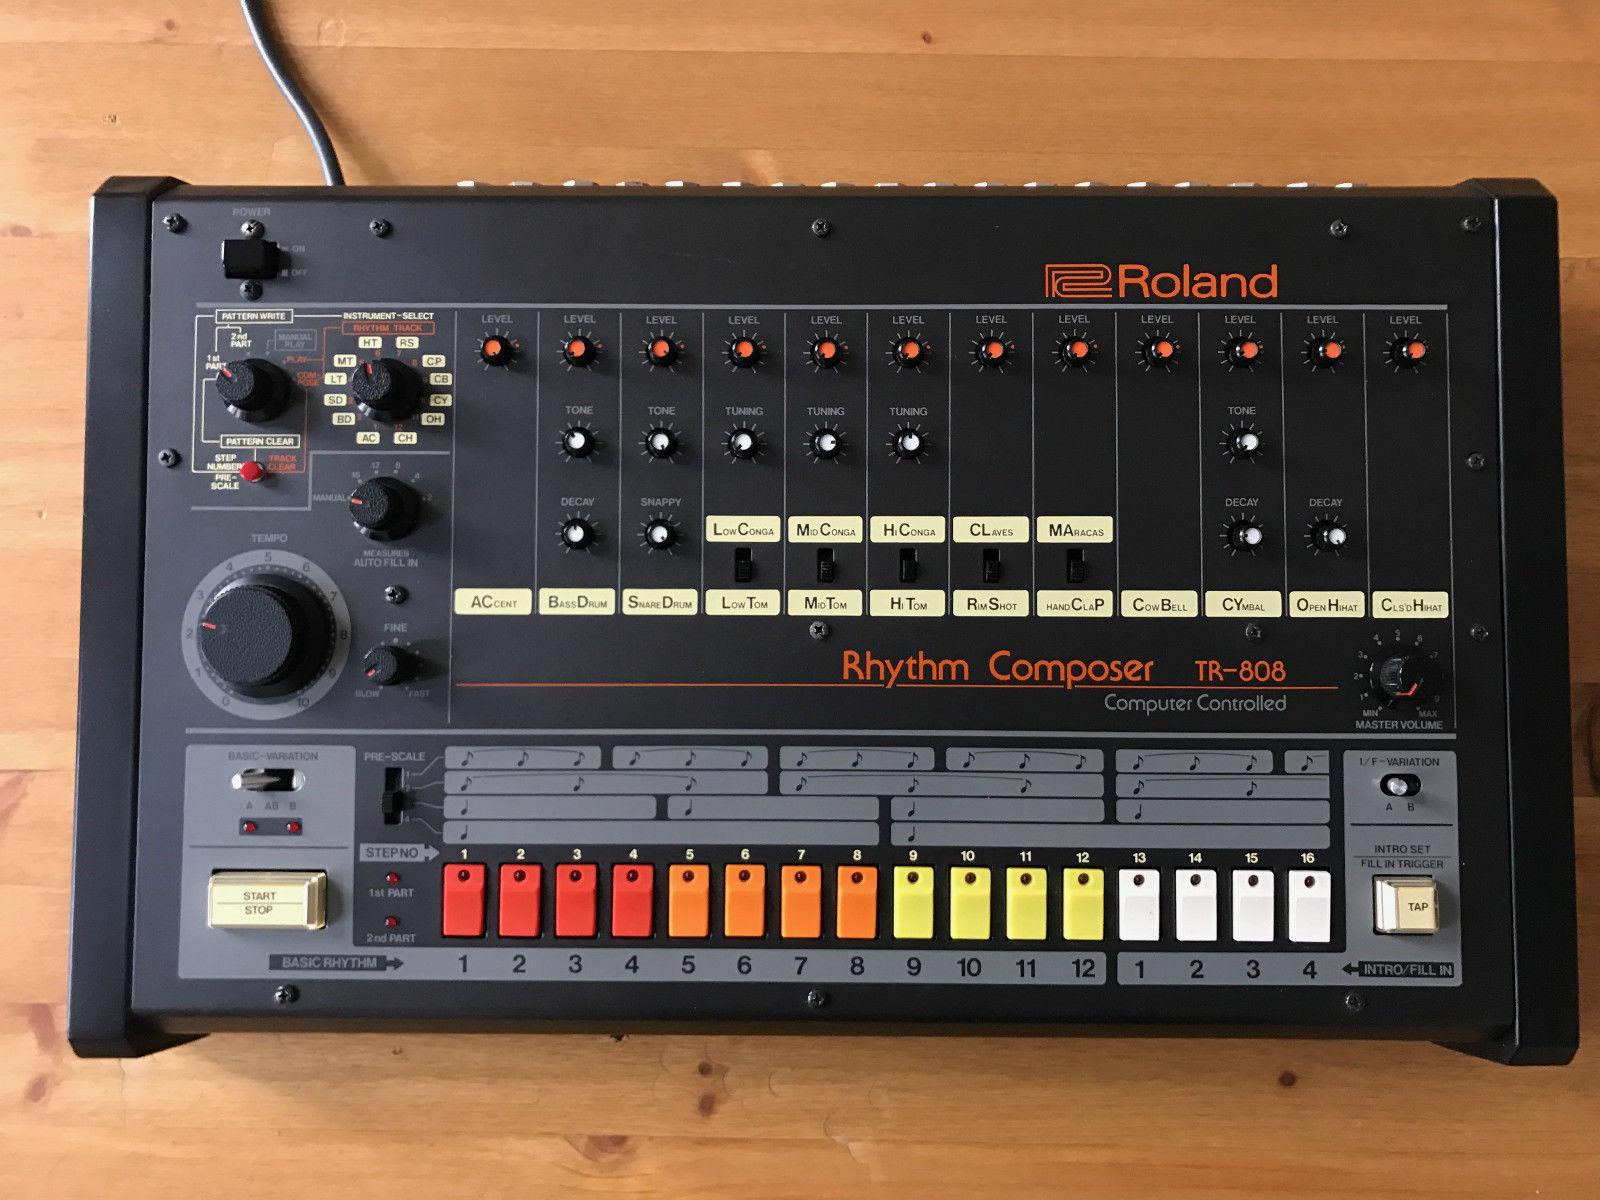 matrixsynth minty roland tr 808 rhythm composer drum machine. Black Bedroom Furniture Sets. Home Design Ideas